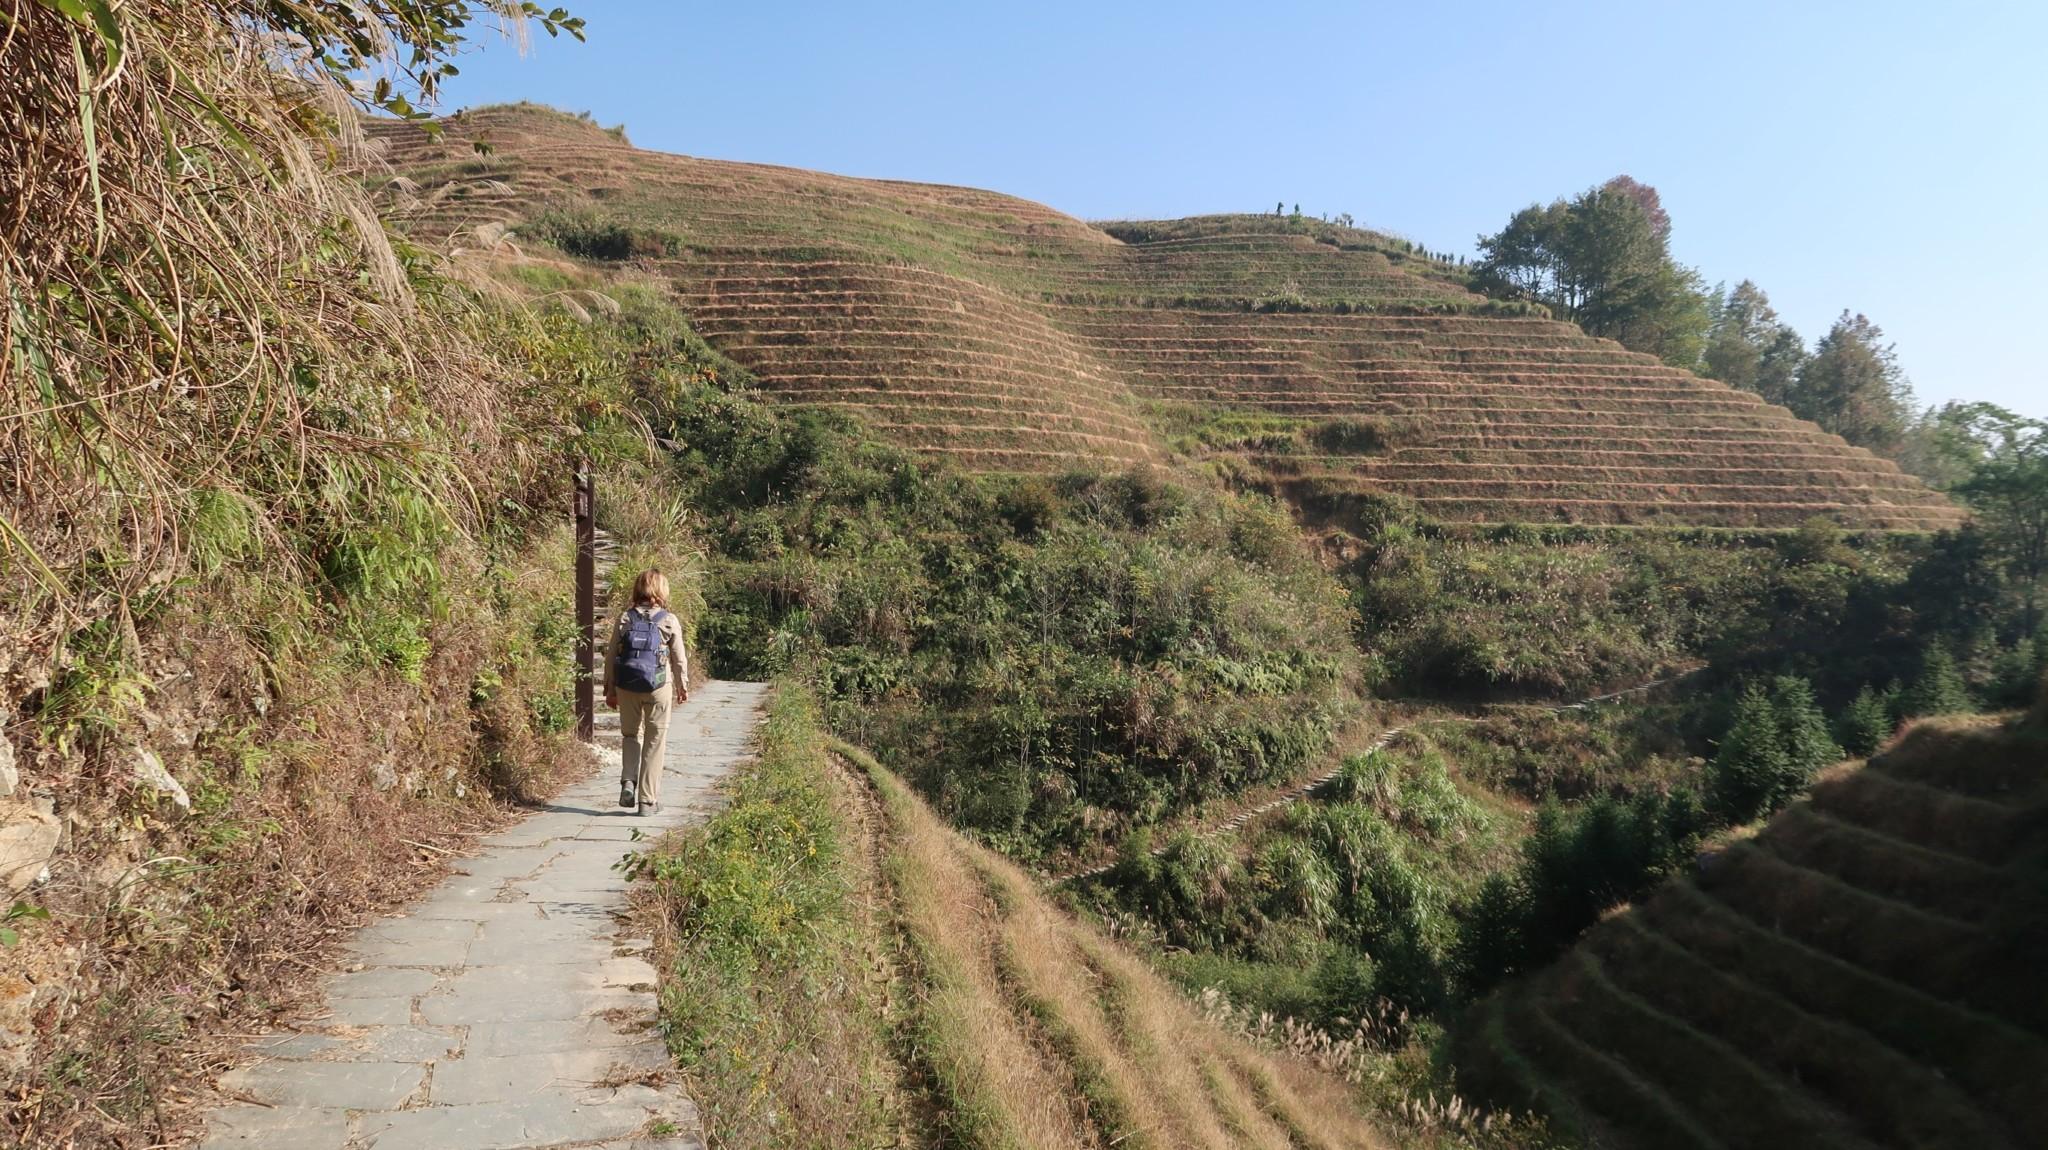 Tiantouzhai - Weg zur Seilbahn in Longsheng bei Guilin - China